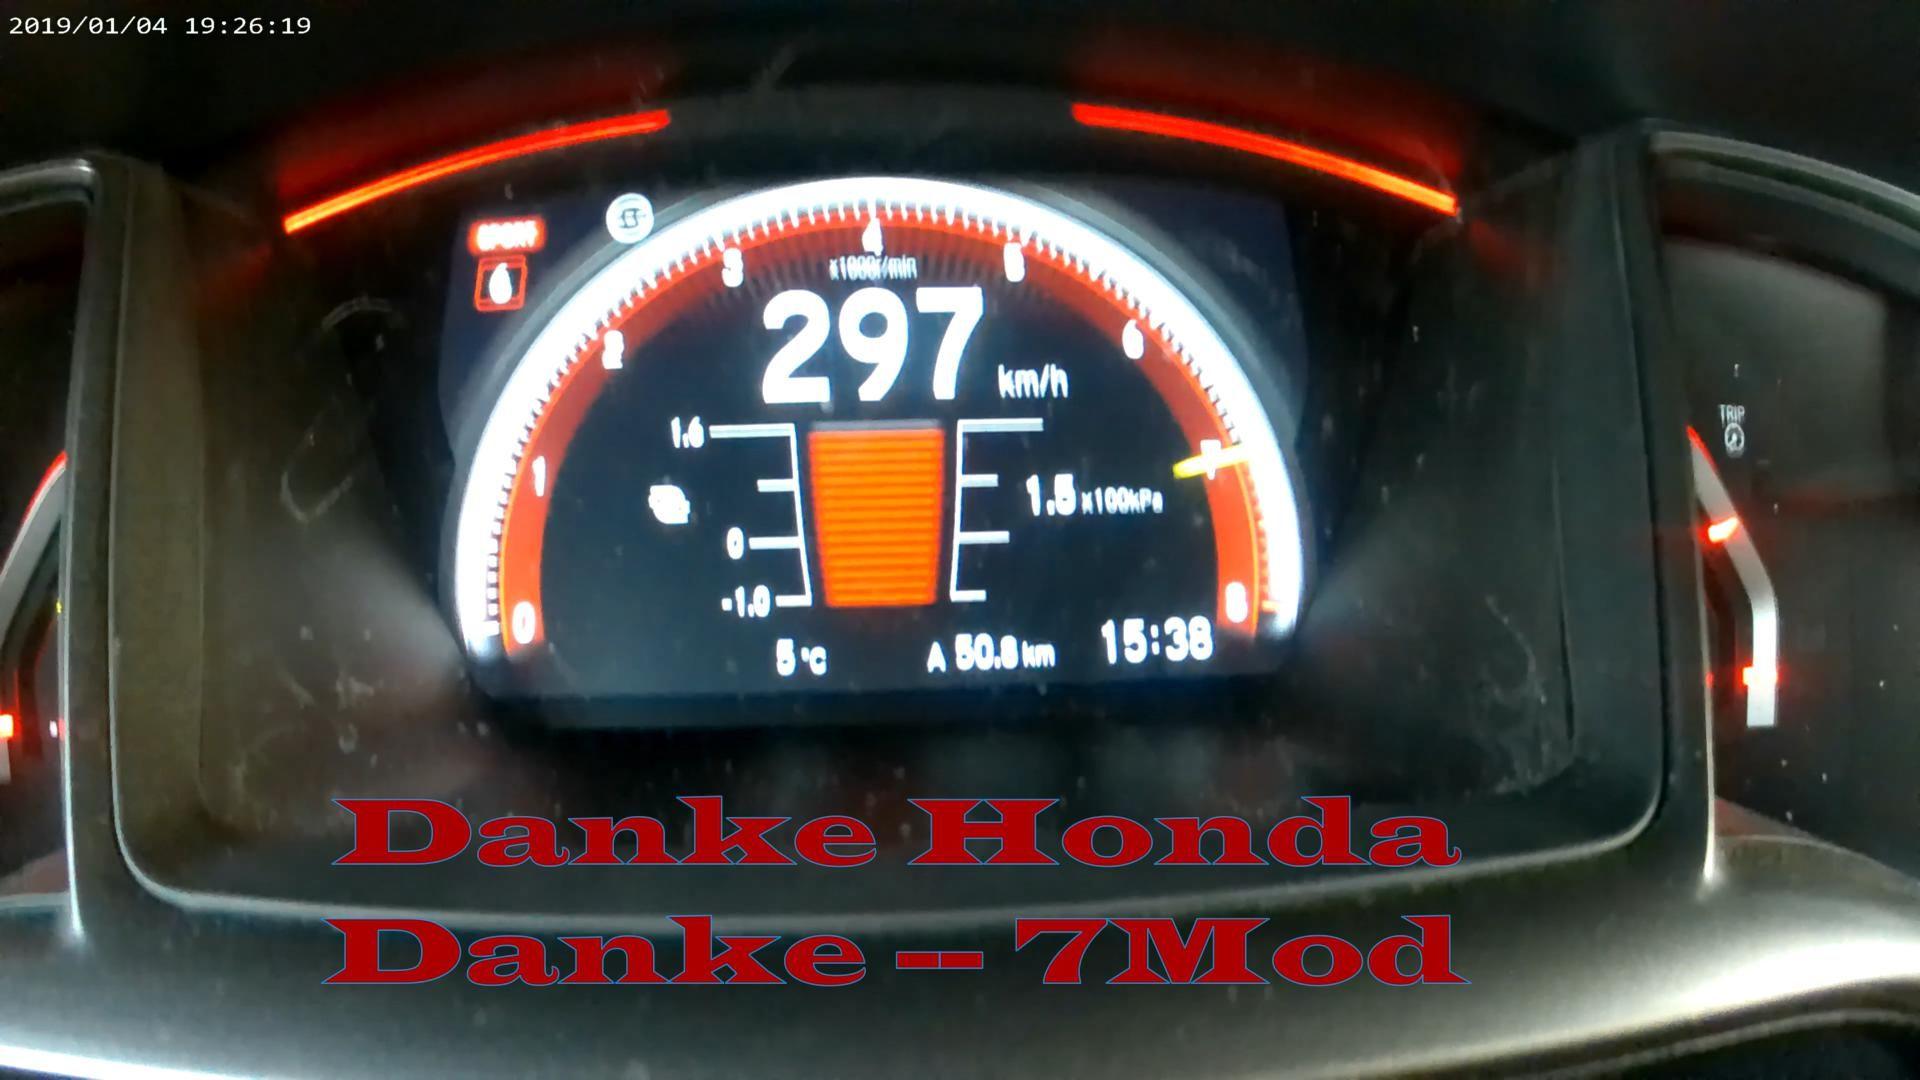 Hondy Civic Typer Fk8 Top Speed 297 Km H Honda Civic Honda Civic Type R Honda